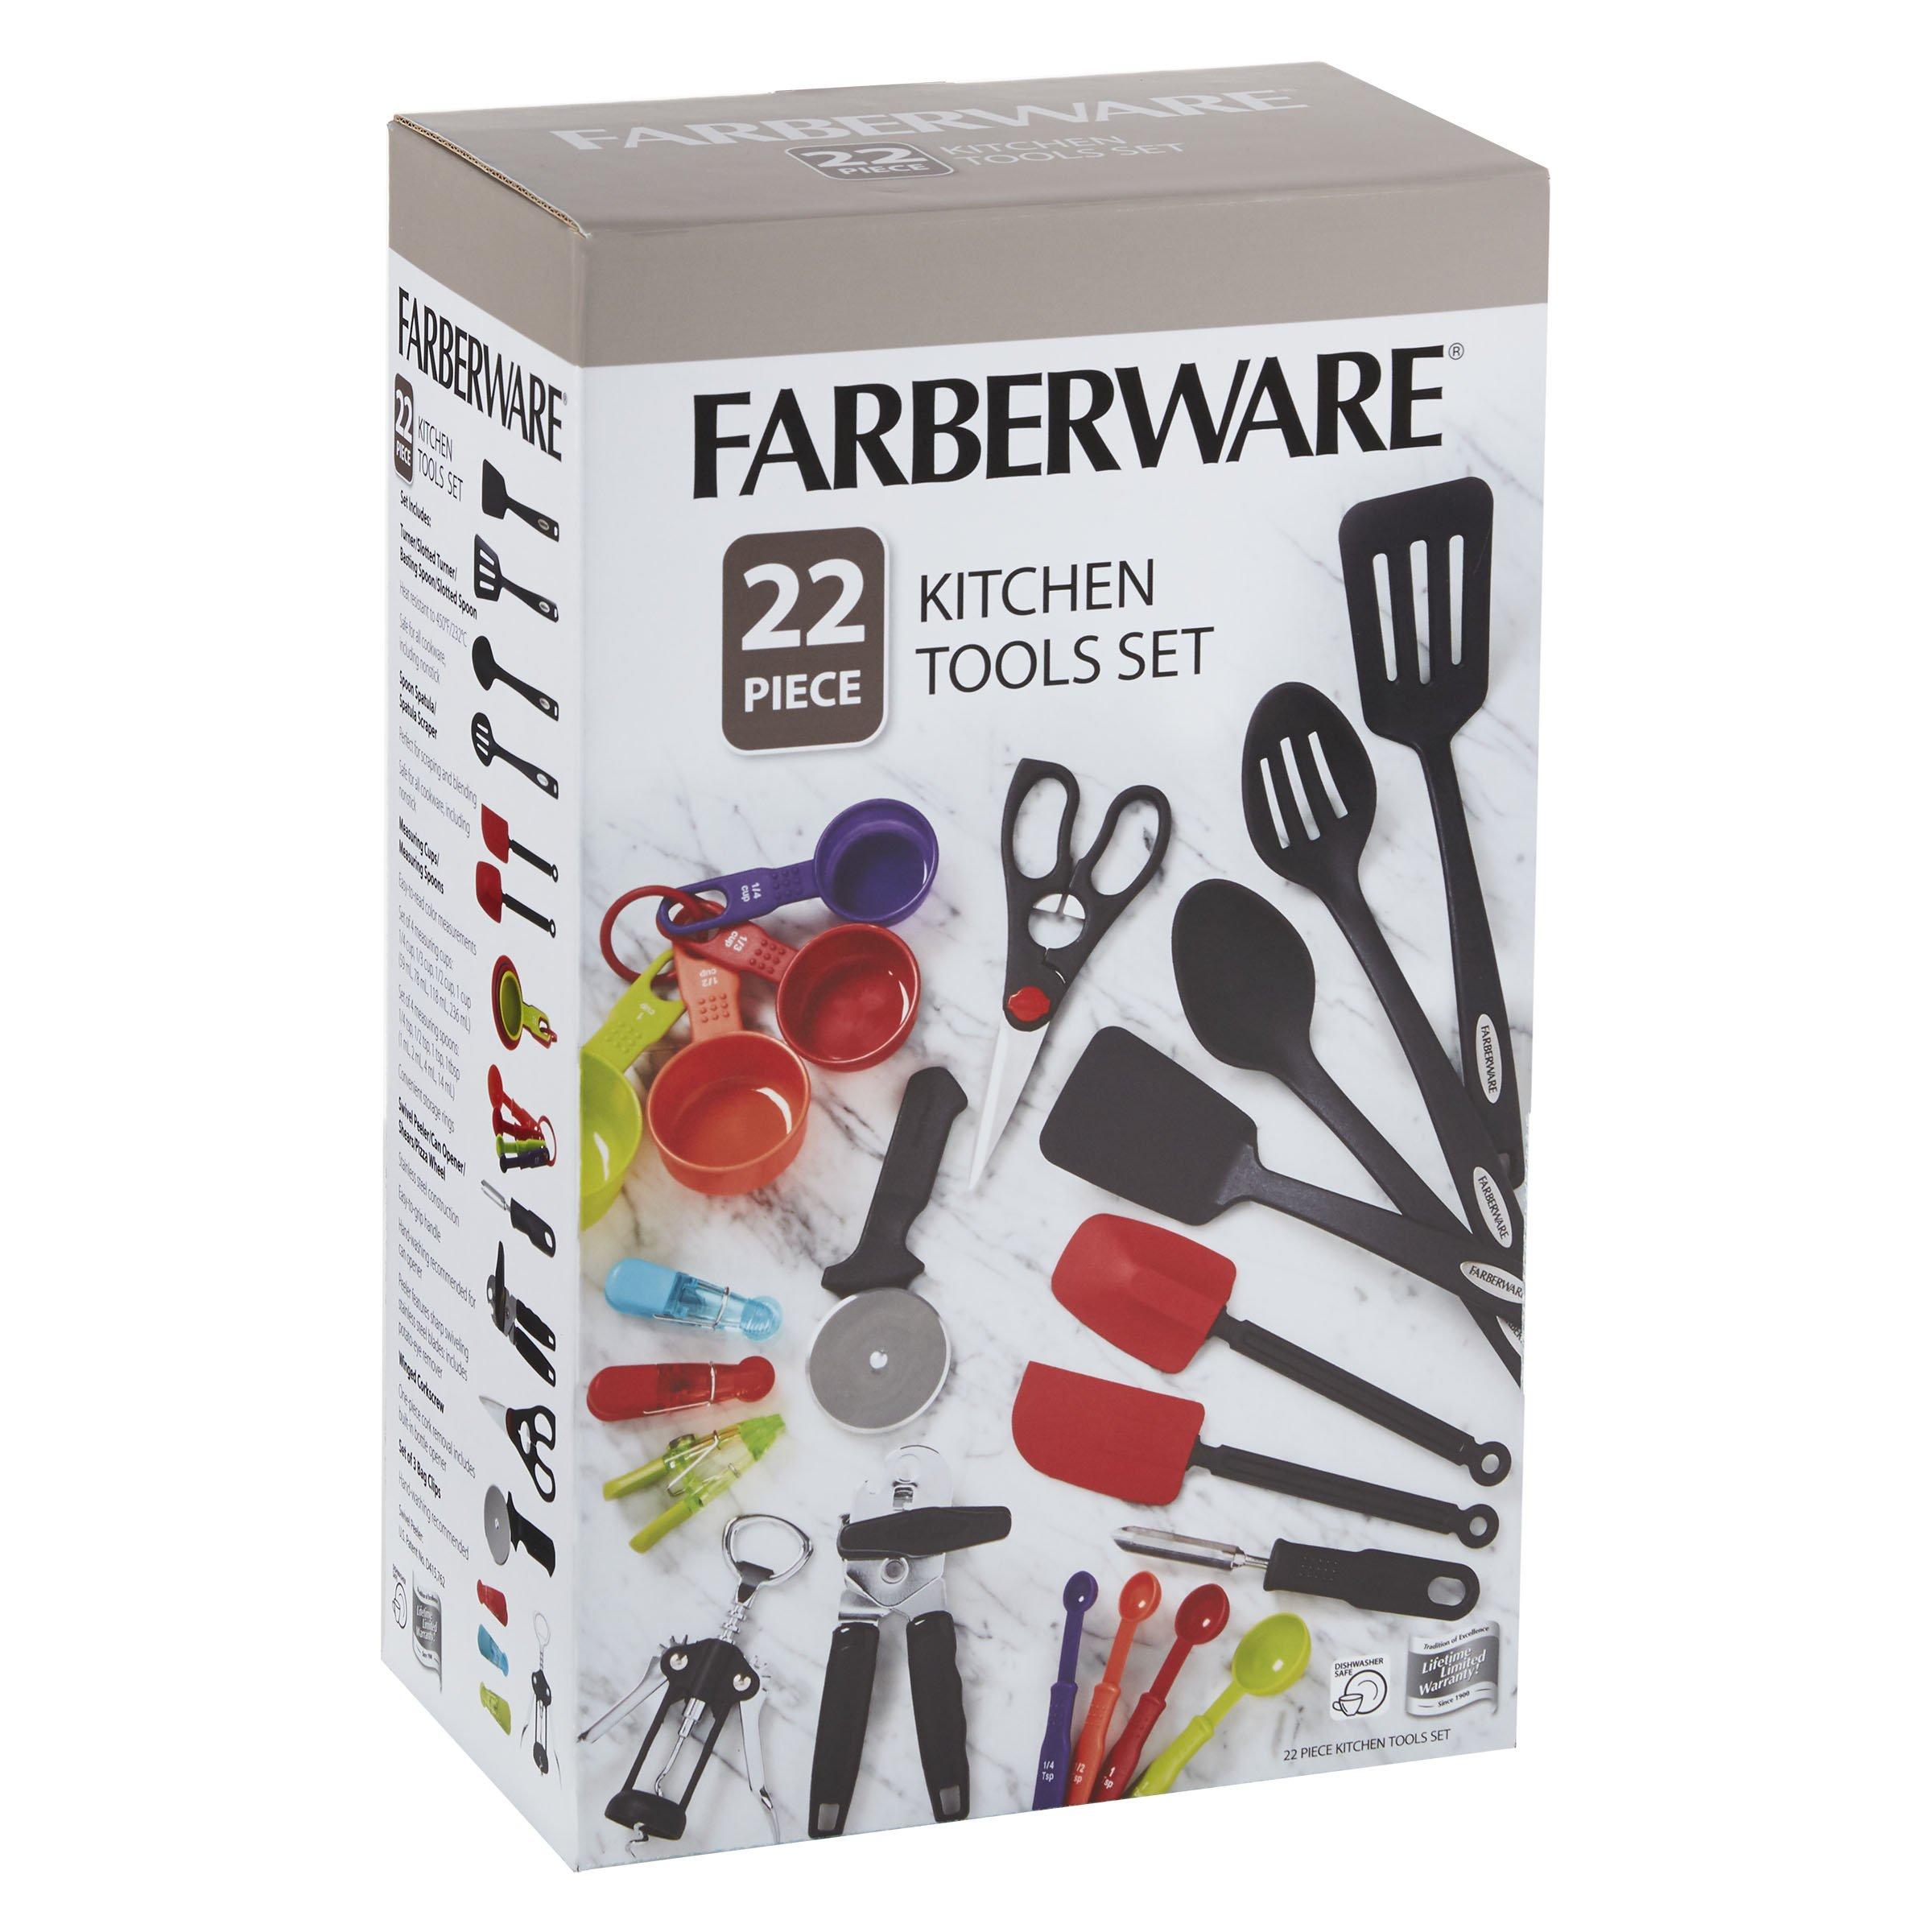 Farberware 22-Piece Essential Tool and Gadget Set by Farberware (Image #3)